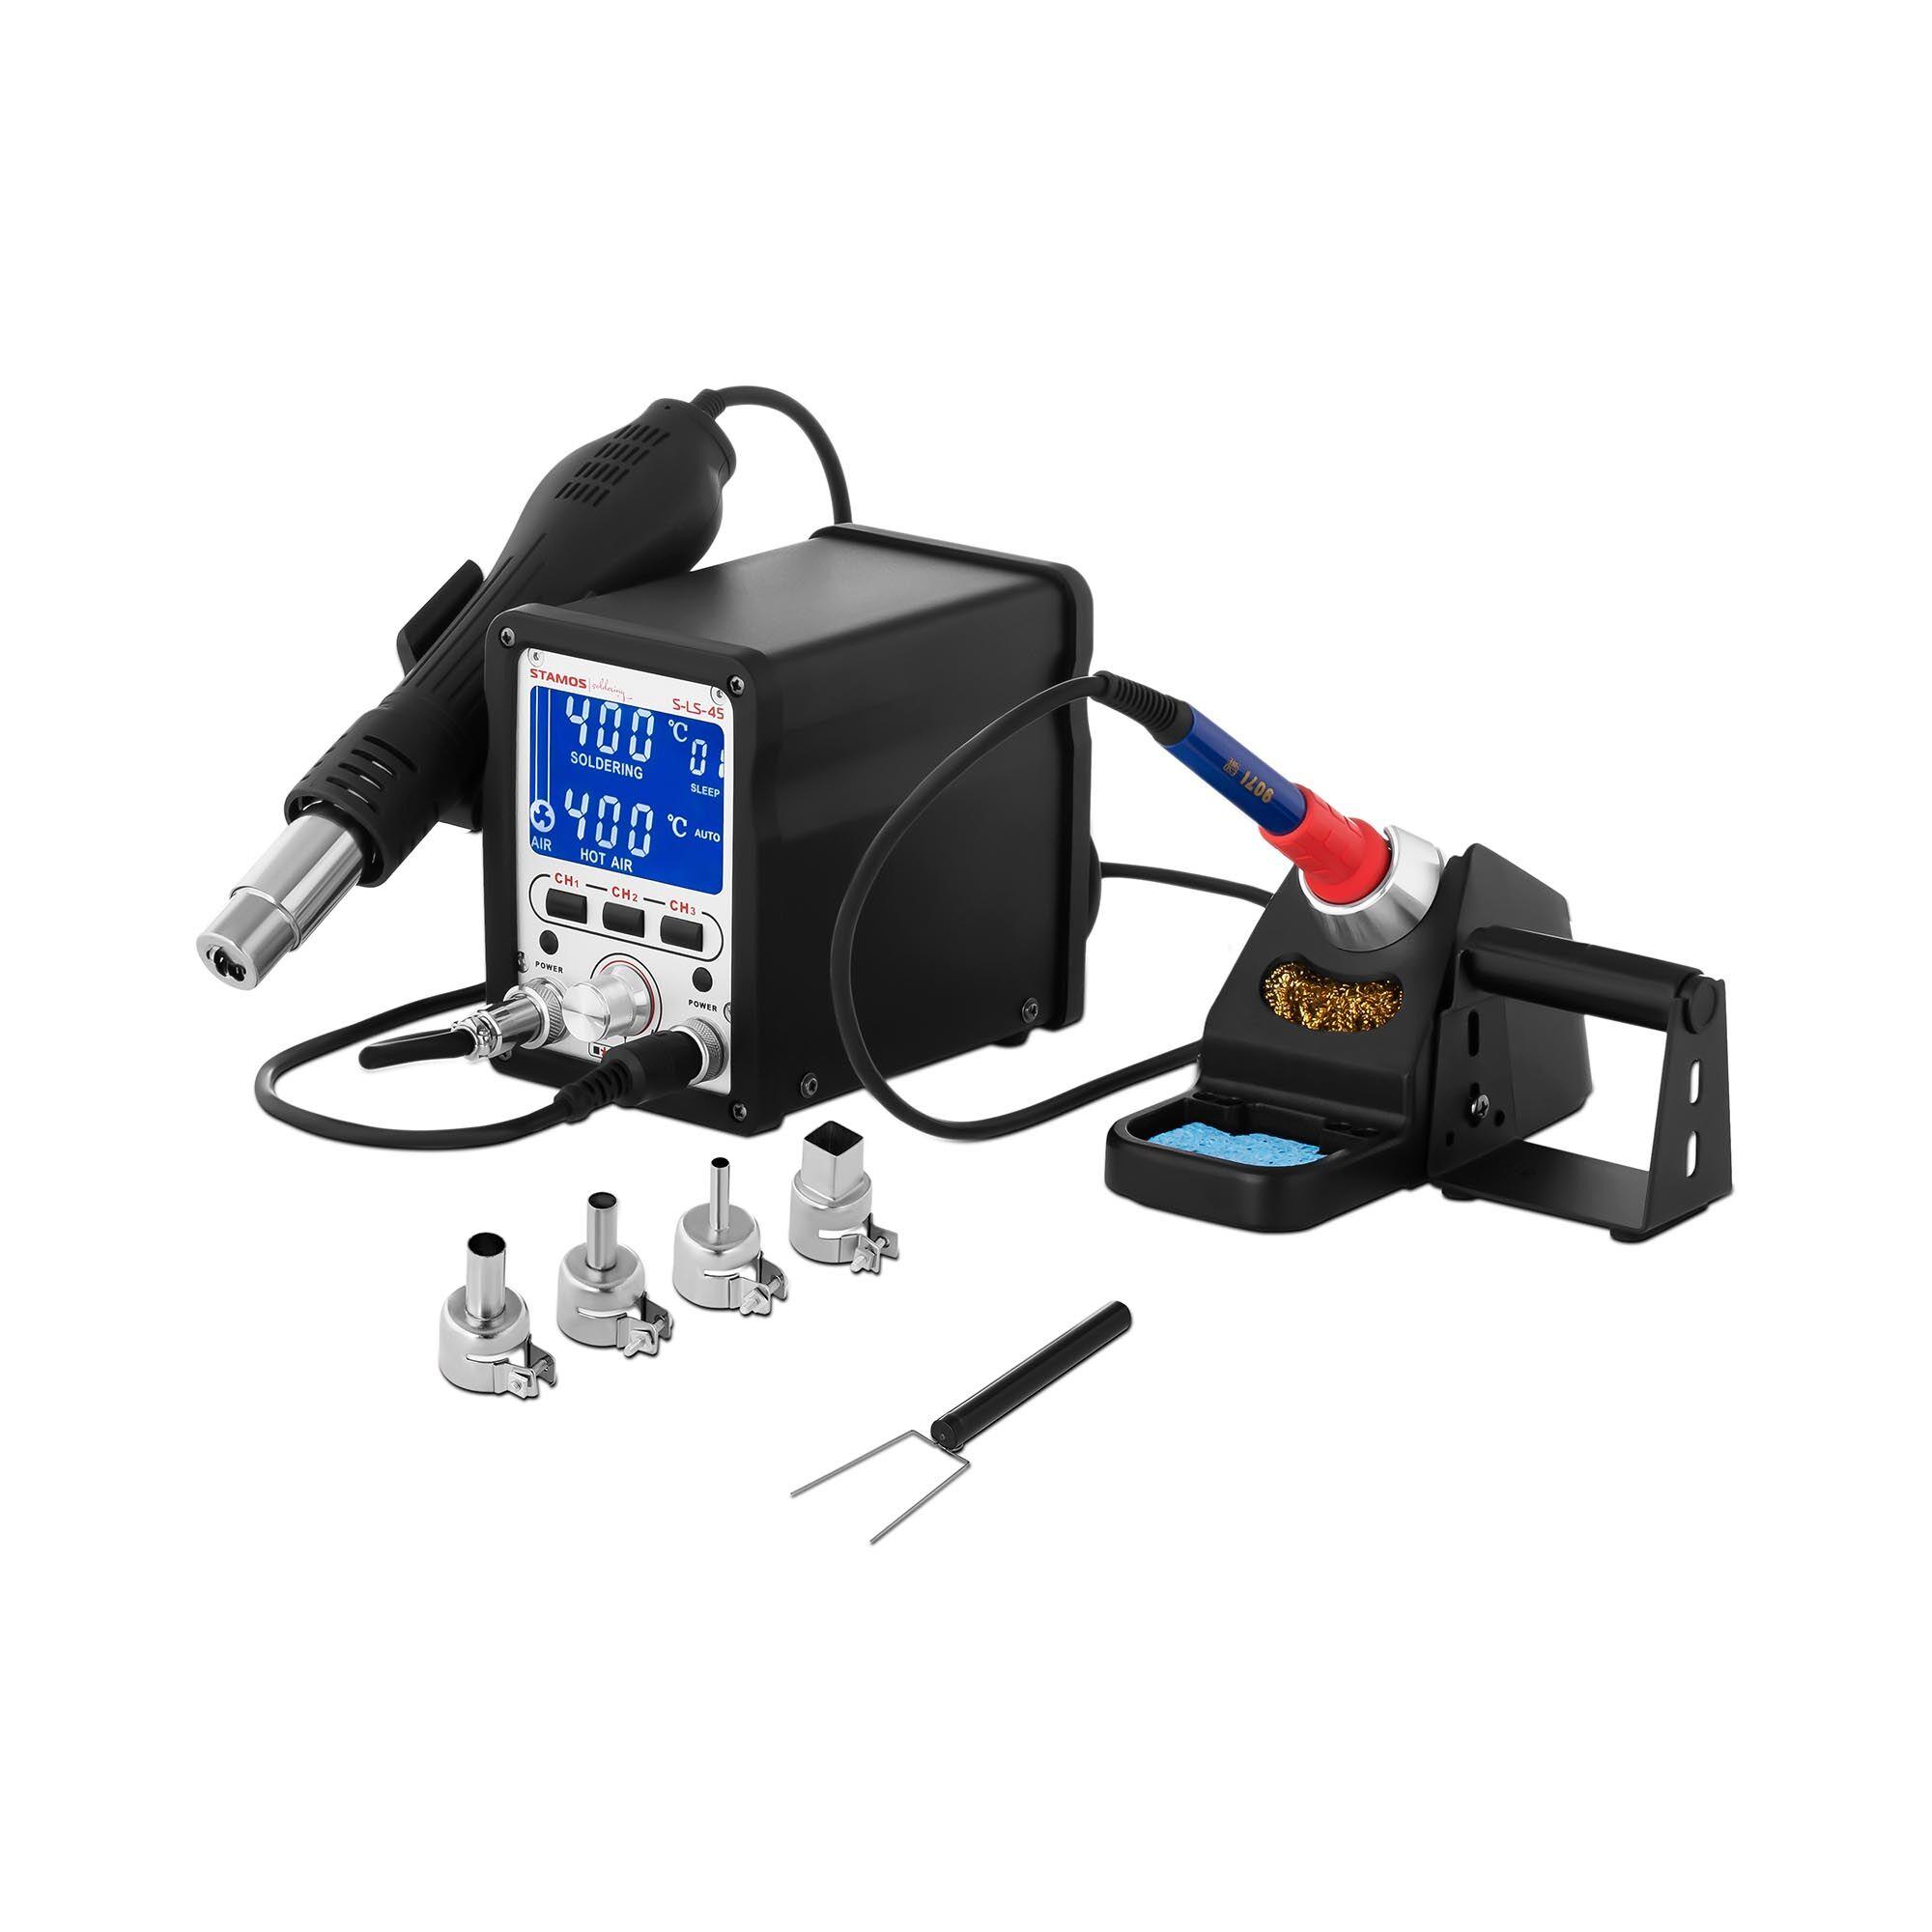 Stamos Soldering Digital Soldering Station - 70 W - Memory buttons